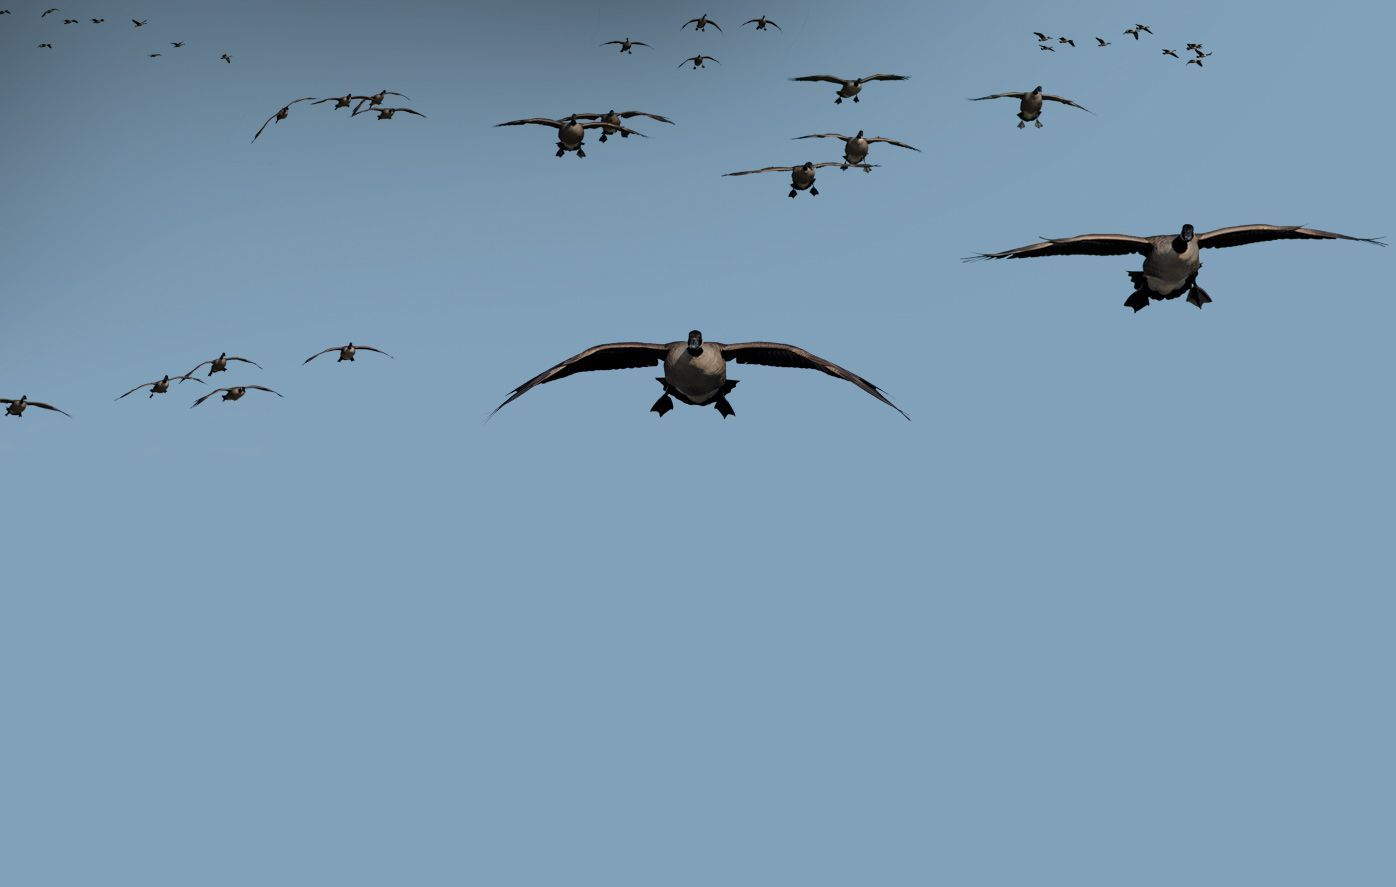 Free Waterfowl Hunting Wallpaper